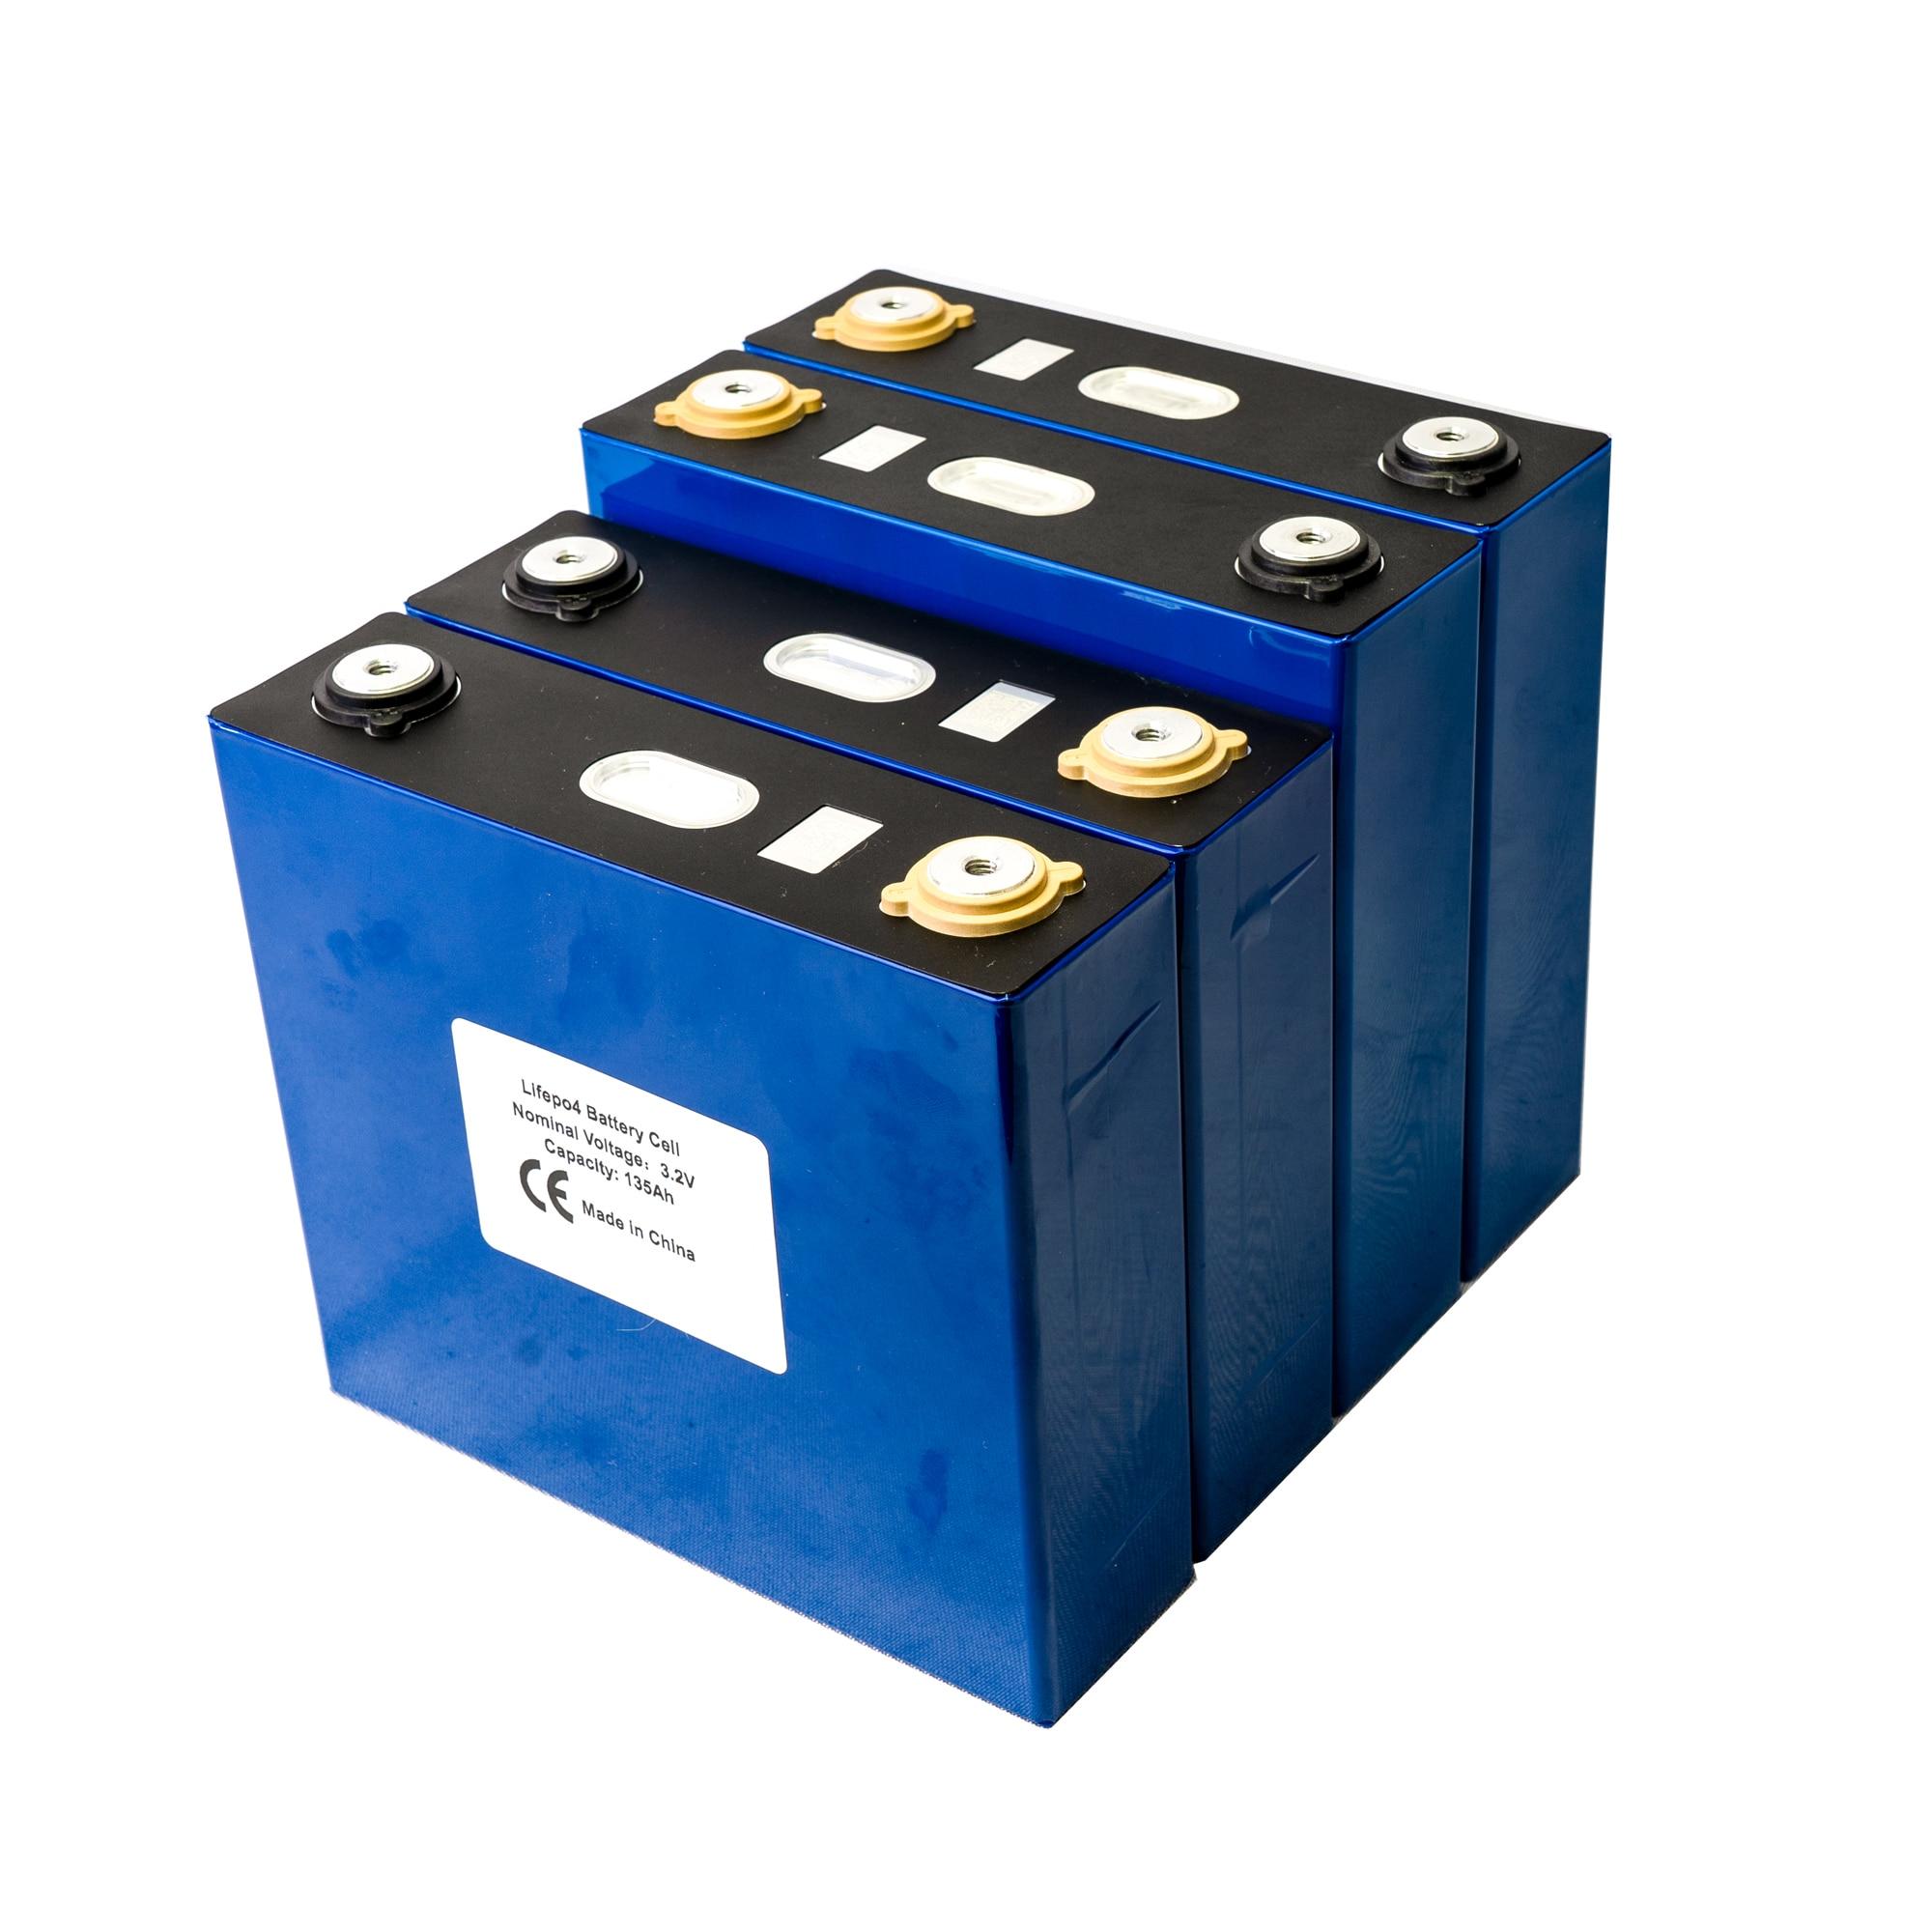 4PCS GRADE A 3.2V 130AH Lifepo4 Battery Lithium Iron Phosphate Cell Solar12V  24V Cells Not 120AH 150Ah 200AH EU US TAX FREE